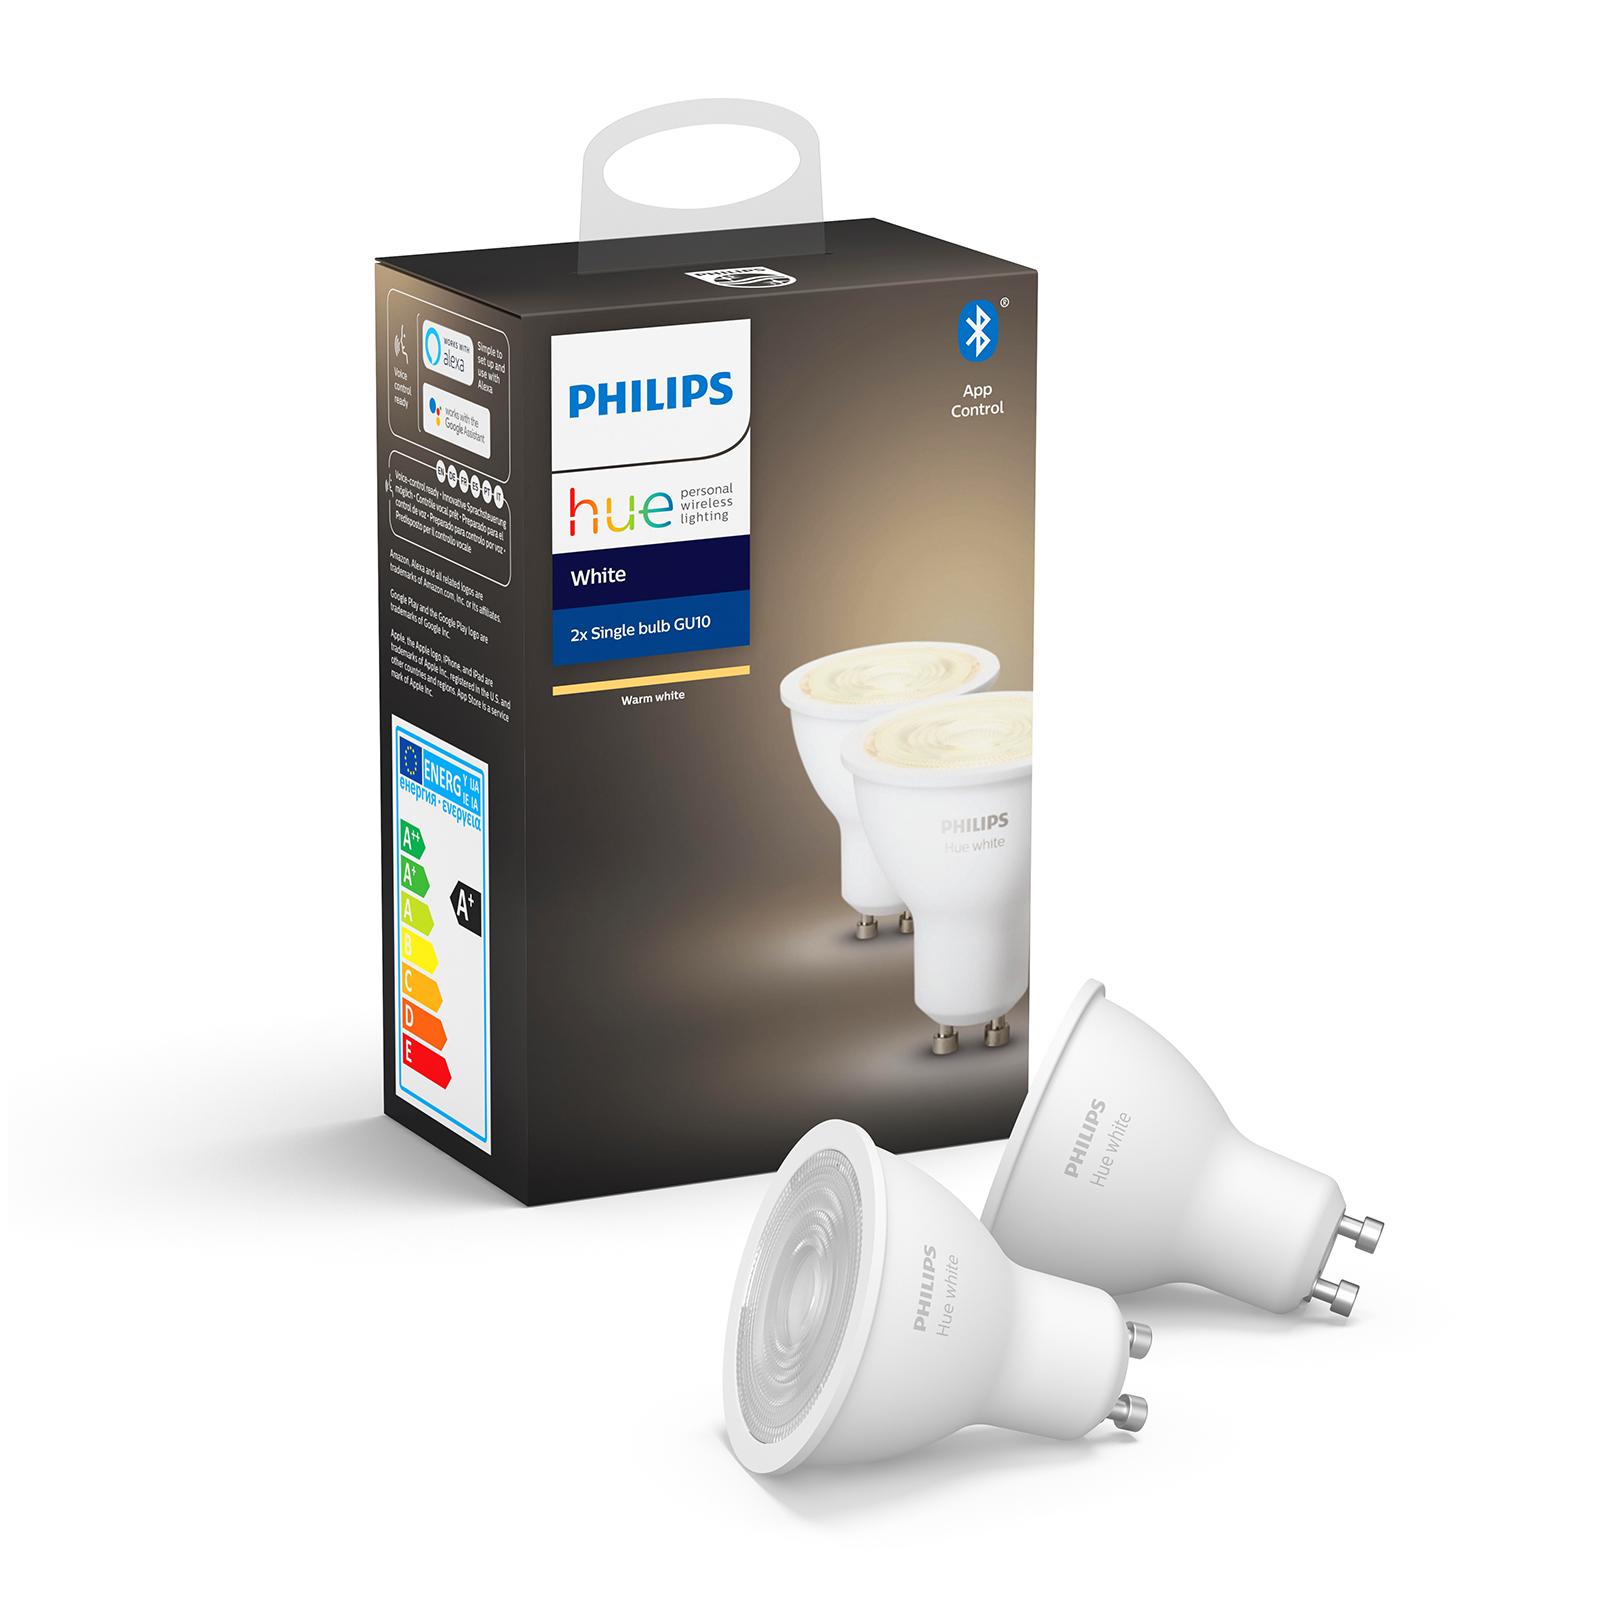 Philips Hue White 5,2 W GU10 LED-Lampe, 2er-Set